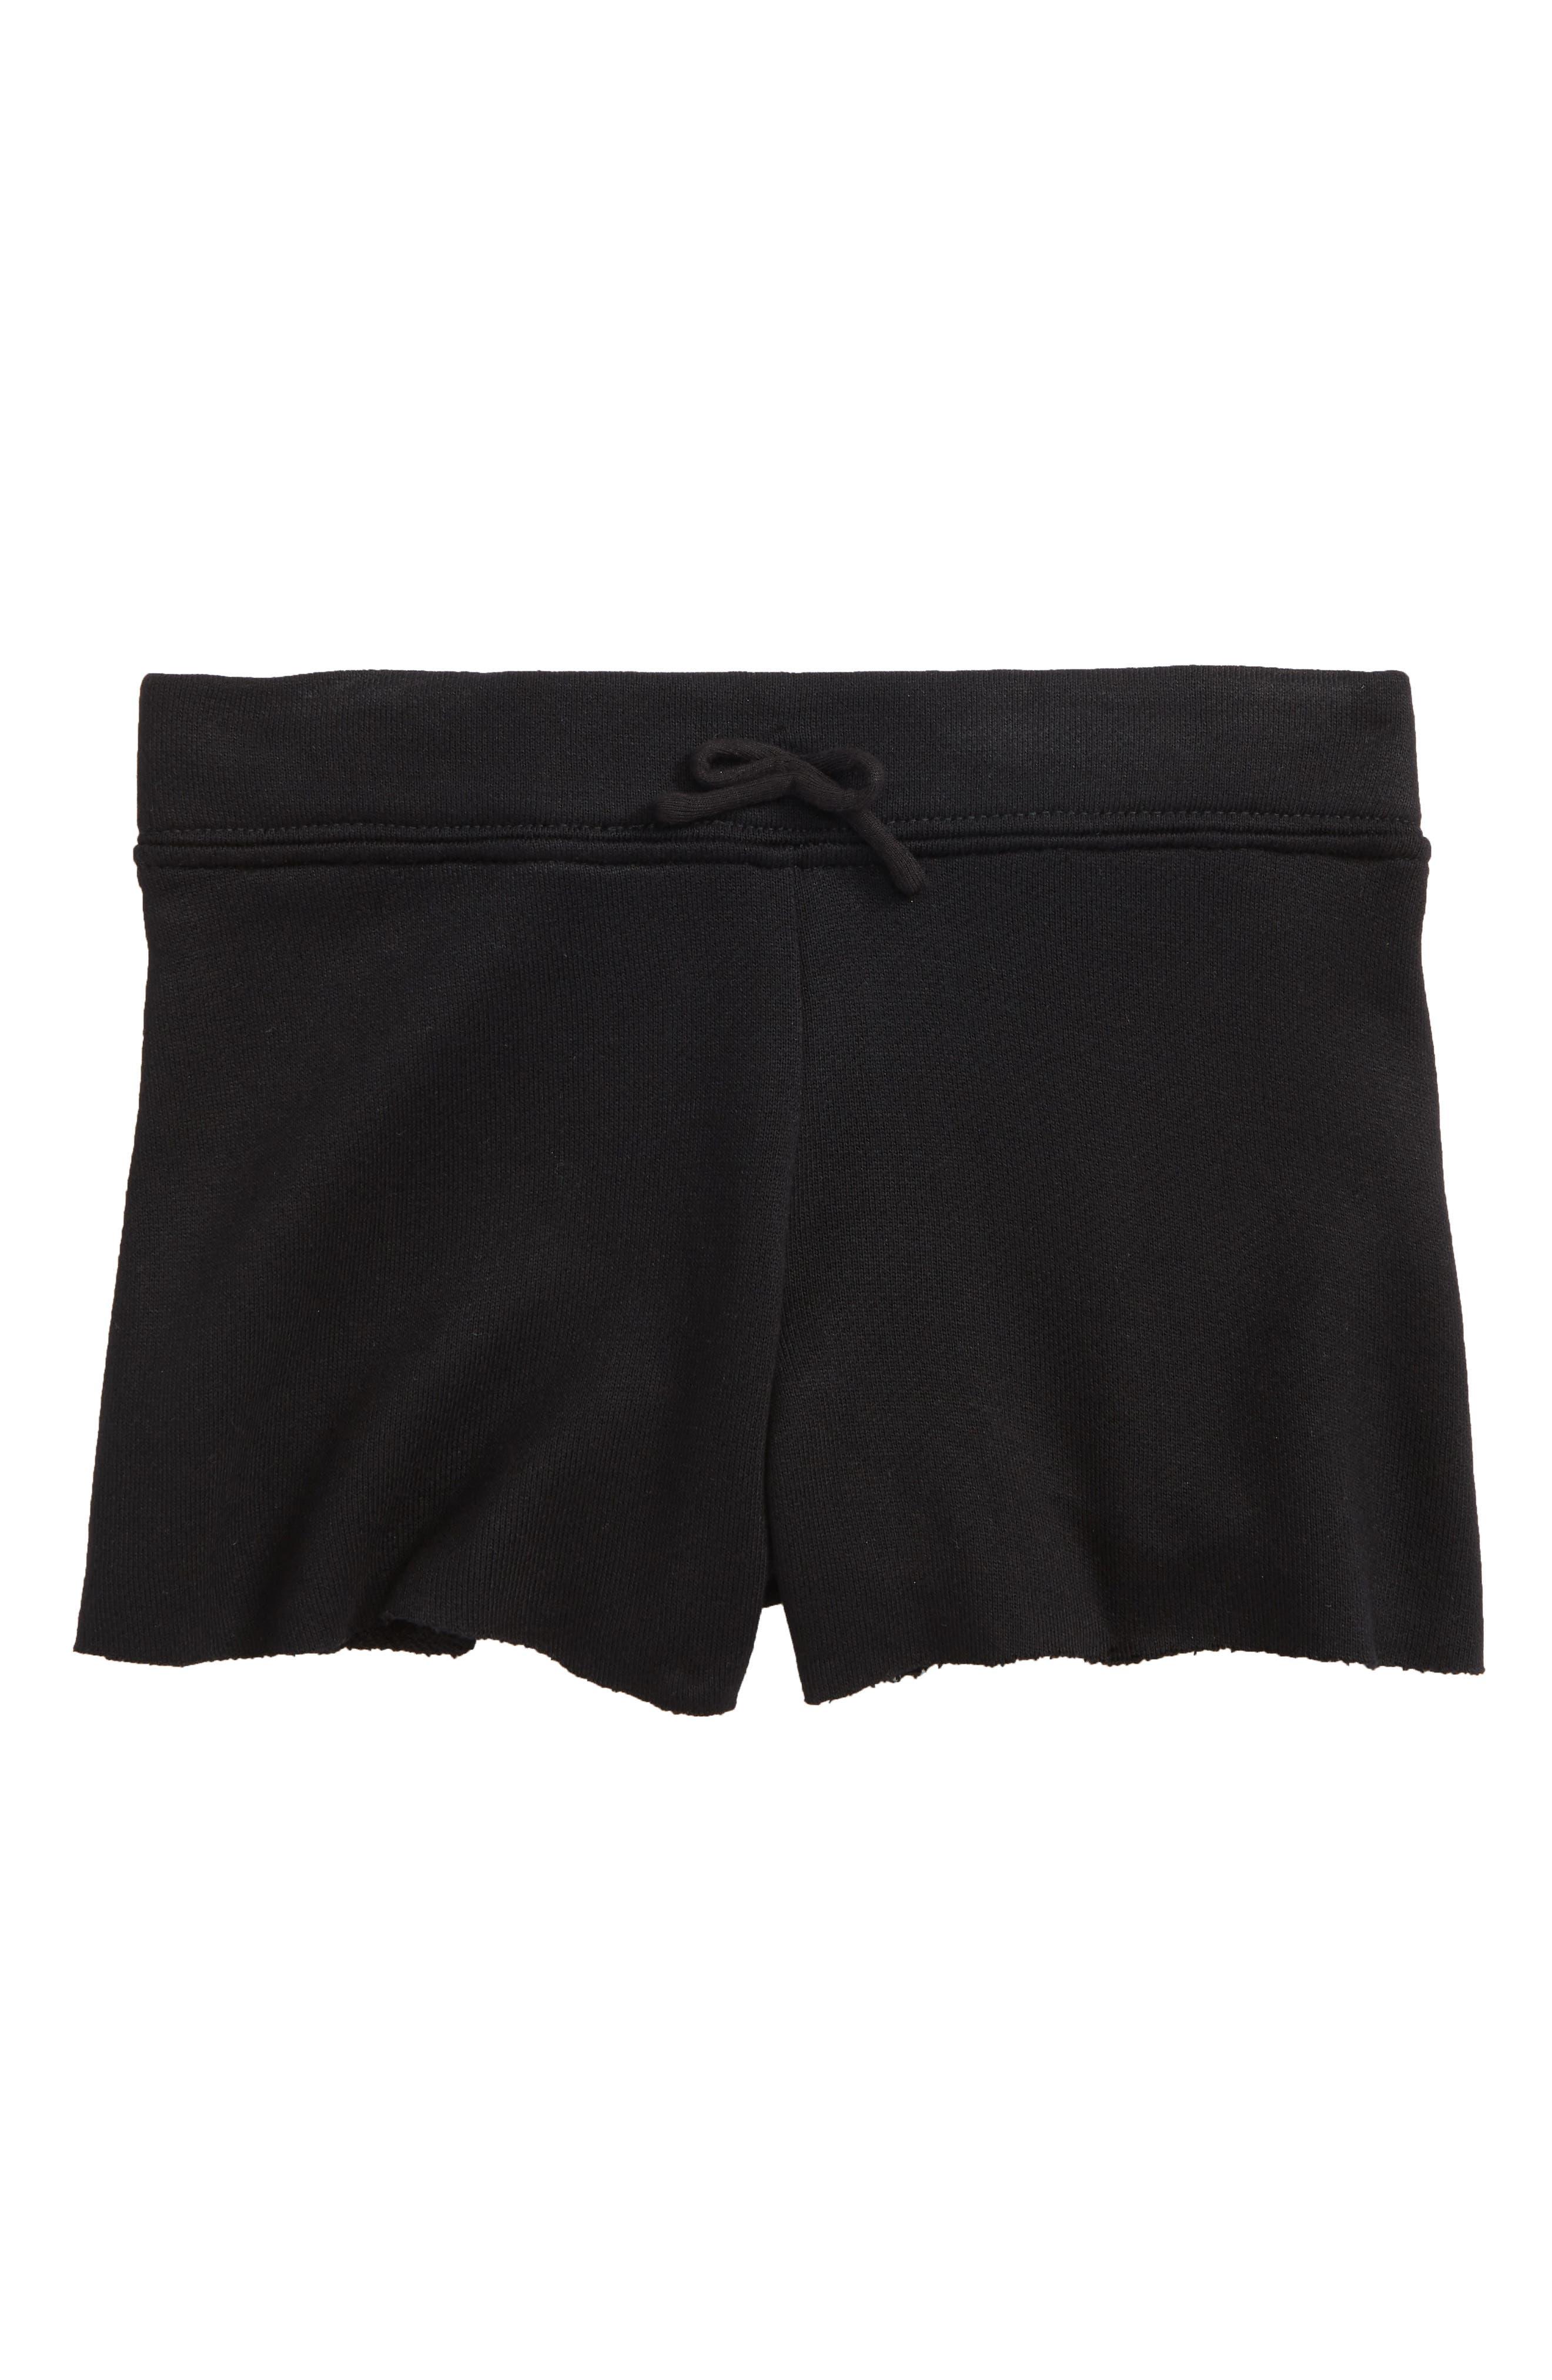 Knit Shorts,                         Main,                         color, Black-Solid